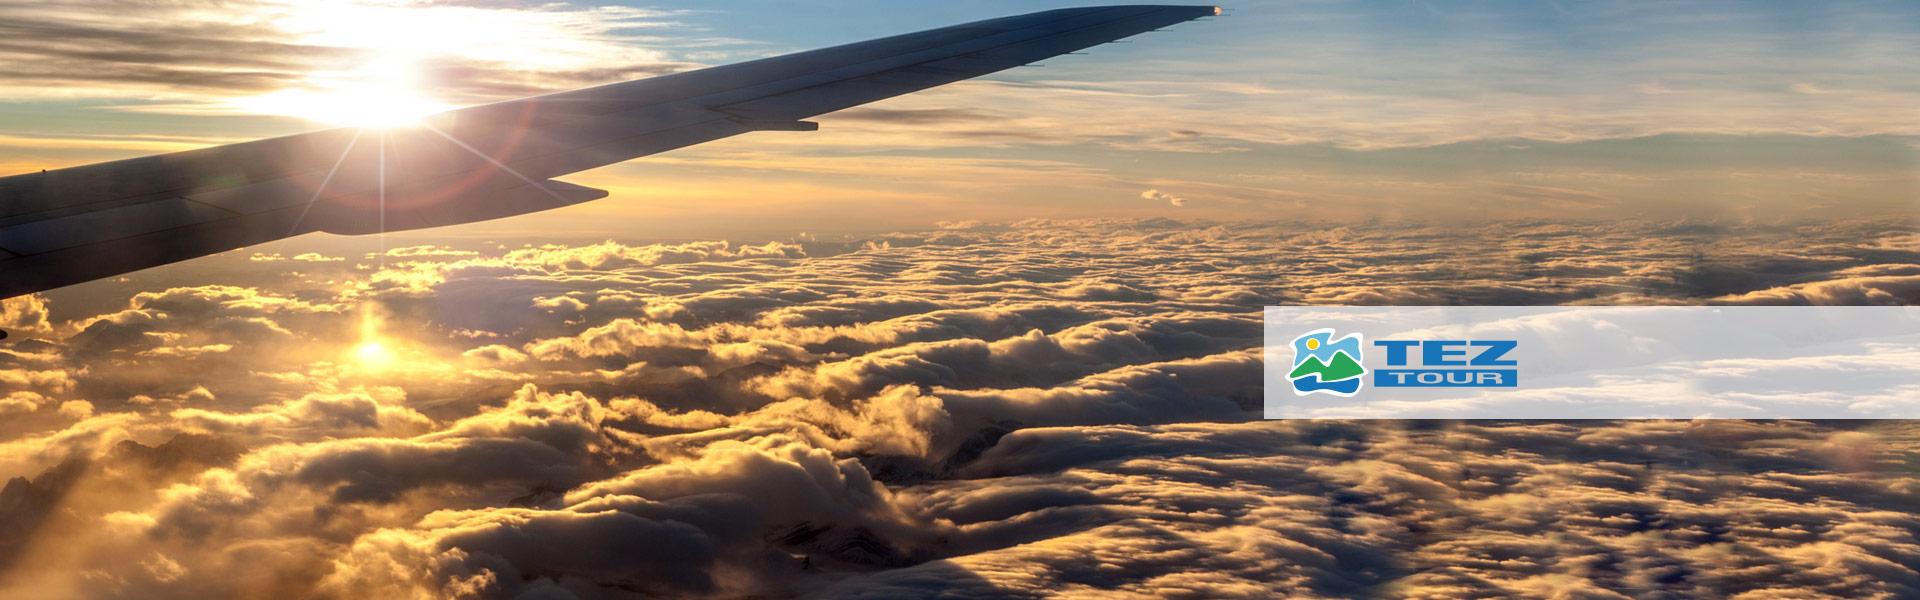 FAQ - BELAVIA - Belarusian Airlines